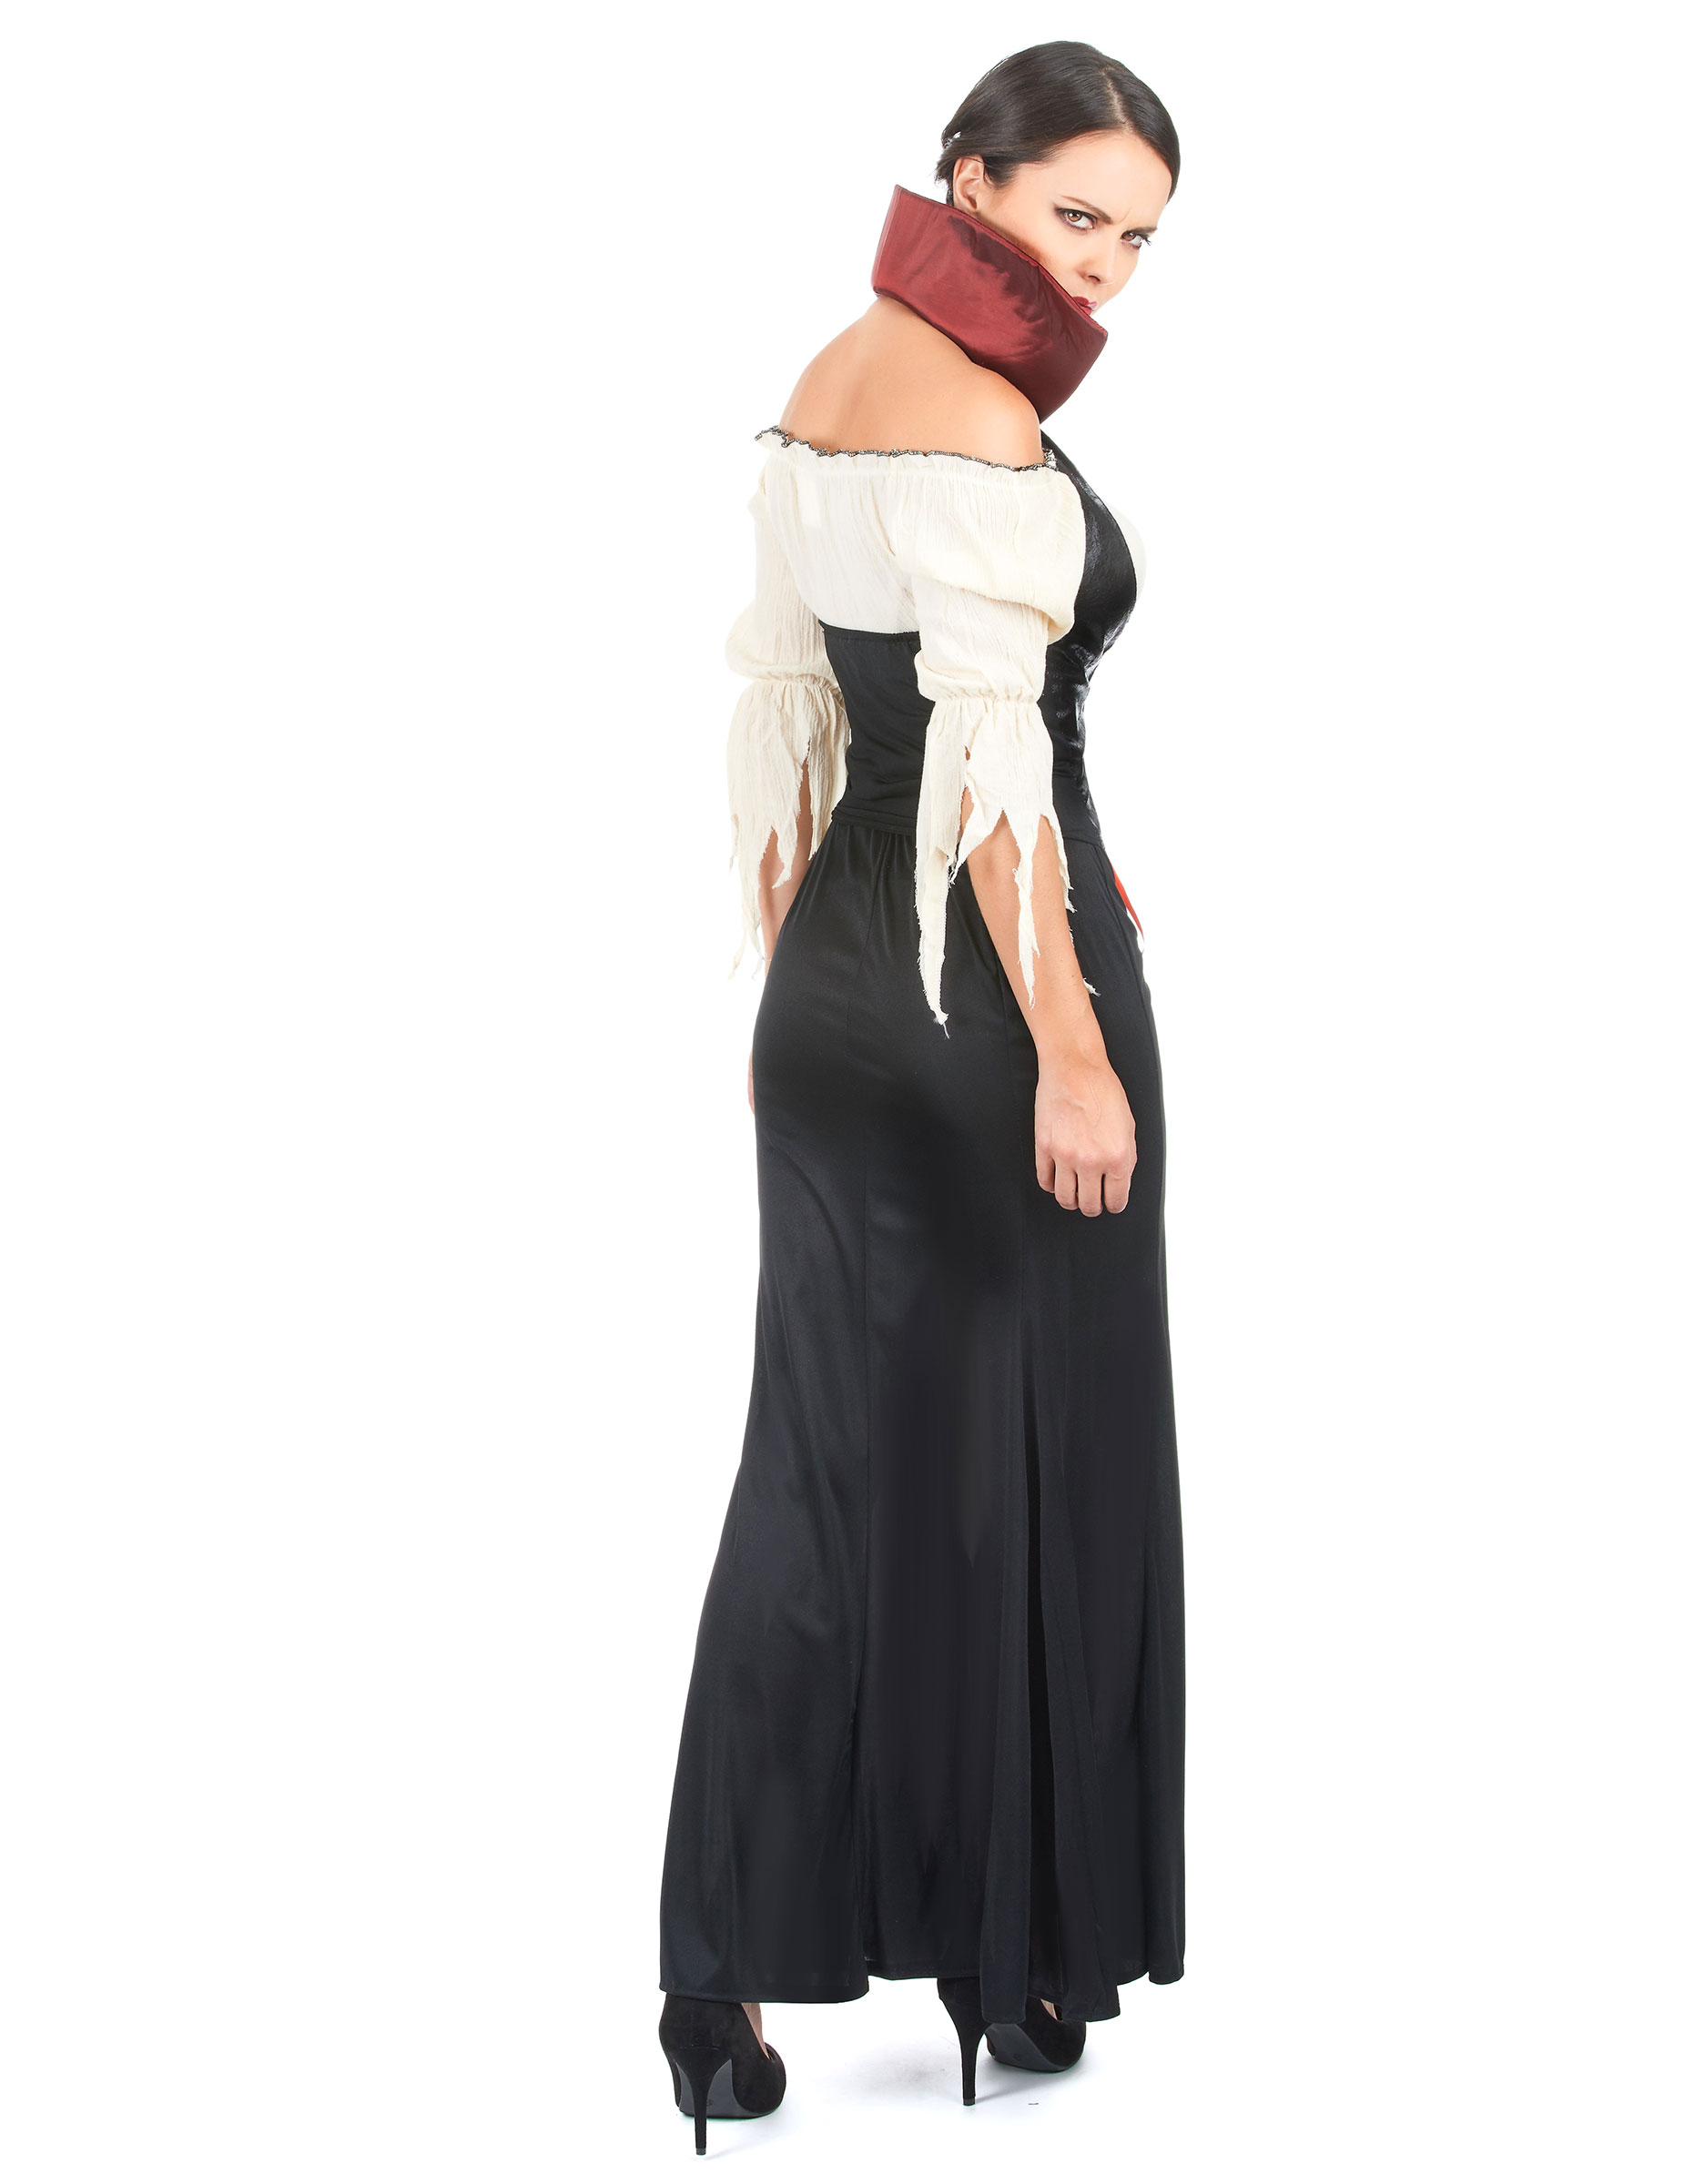 d guisement vampire femme halloween achat de d guisements adultes sur vegaoopro grossiste en. Black Bedroom Furniture Sets. Home Design Ideas